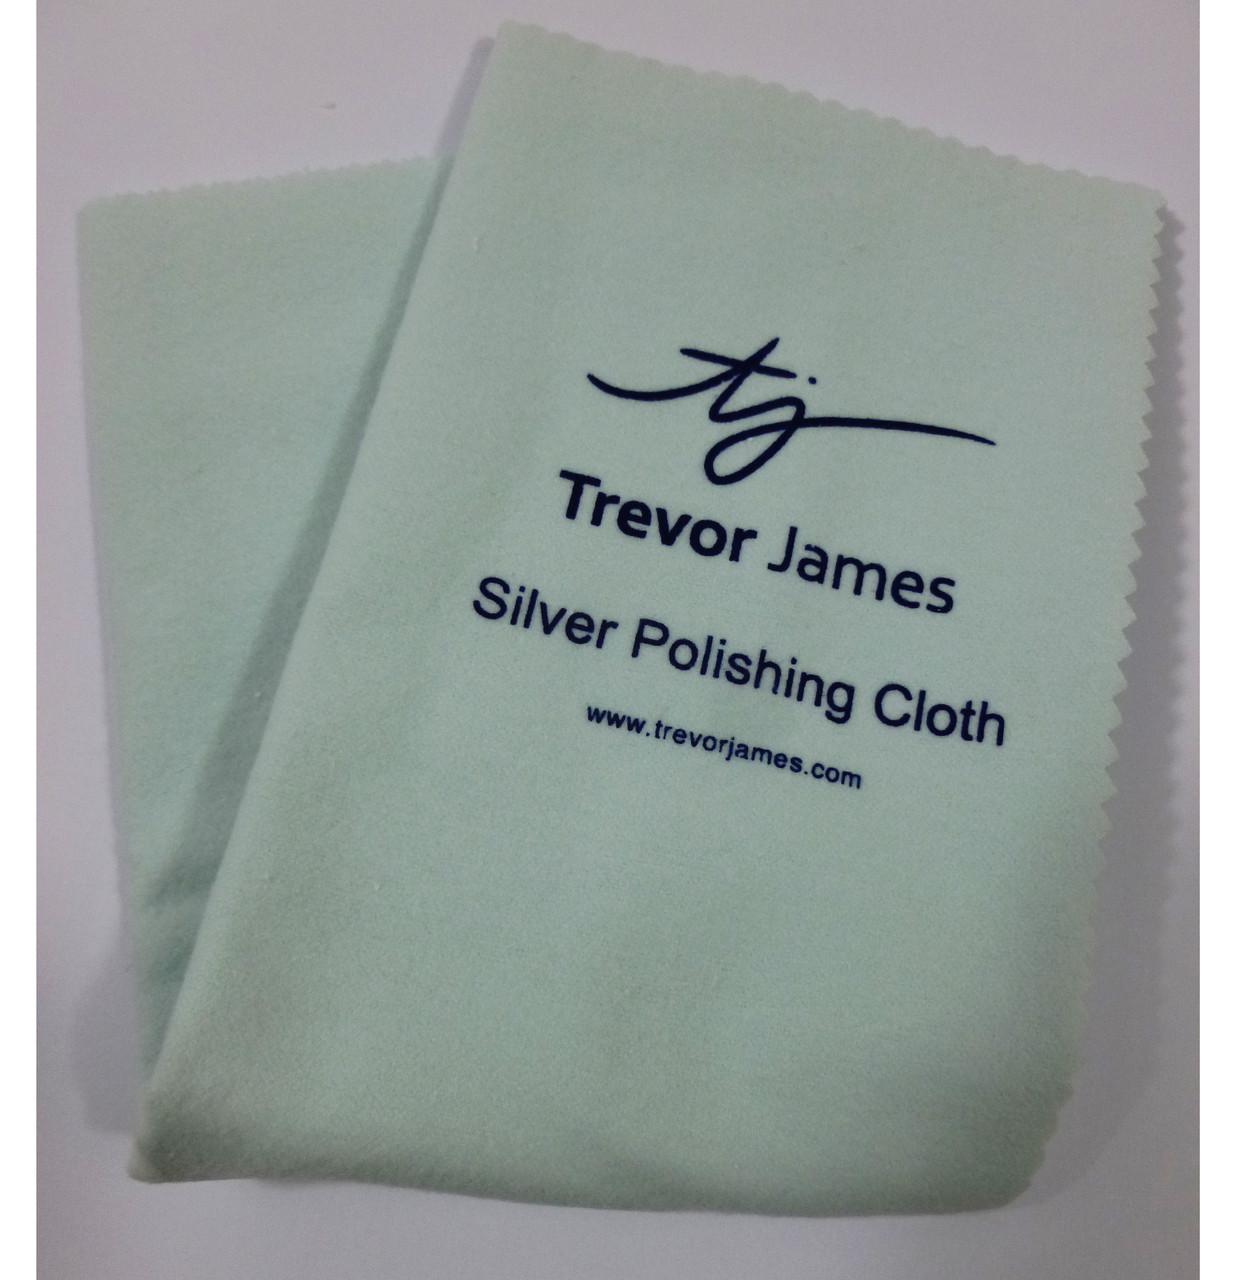 Trevor James Silver Polishing Cloth 1